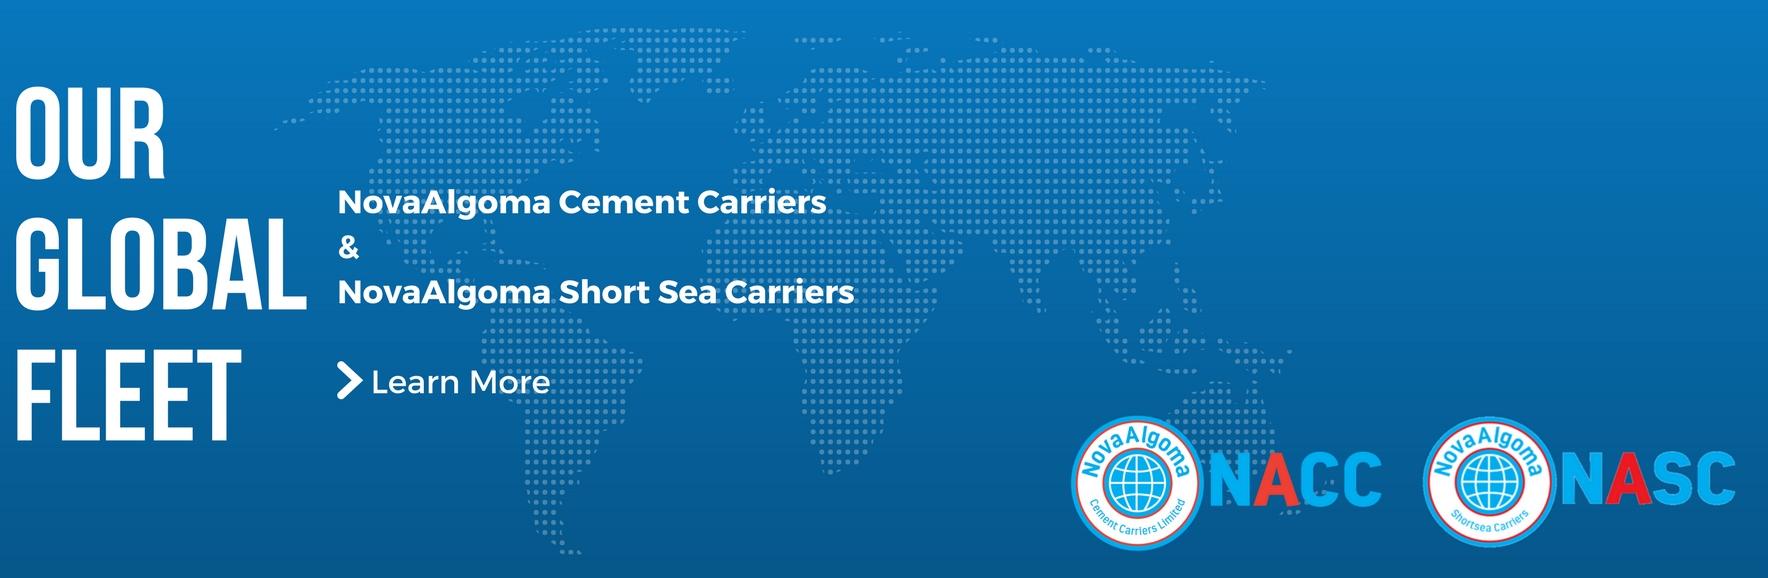 Our Global Fleet